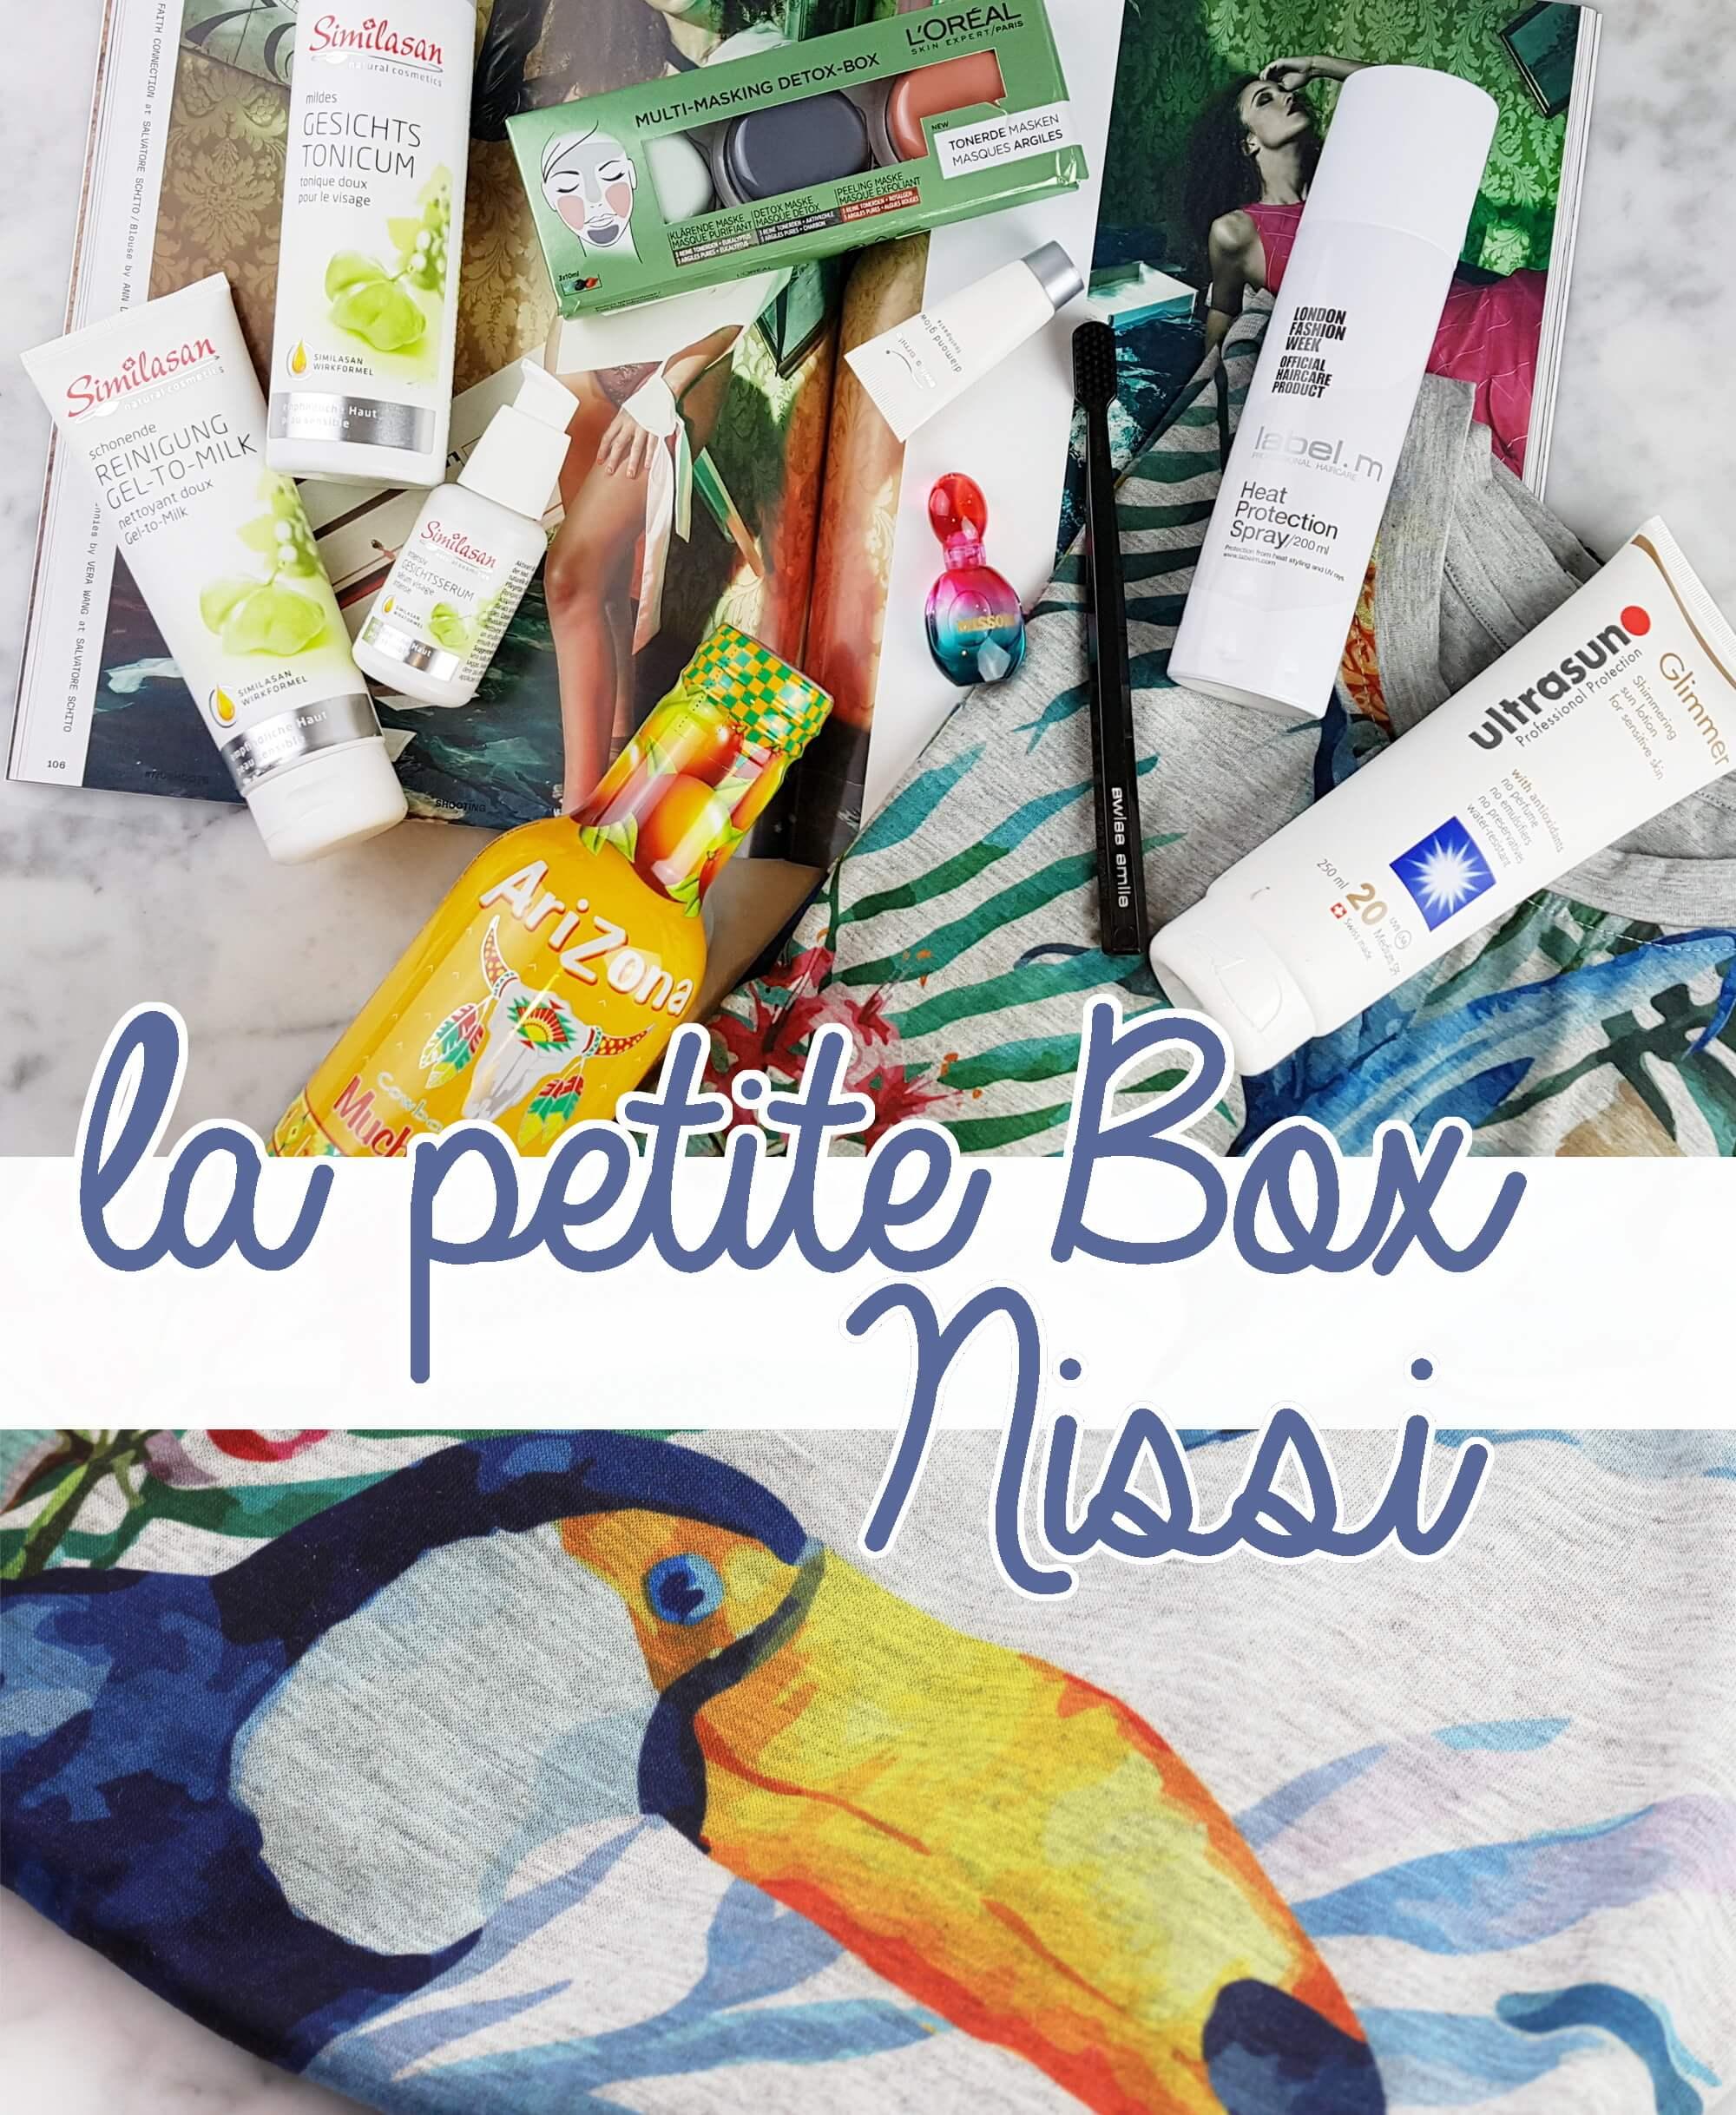 la-petite-Box-Nissi-Edition-im-Mai-Gutschein-tantedine